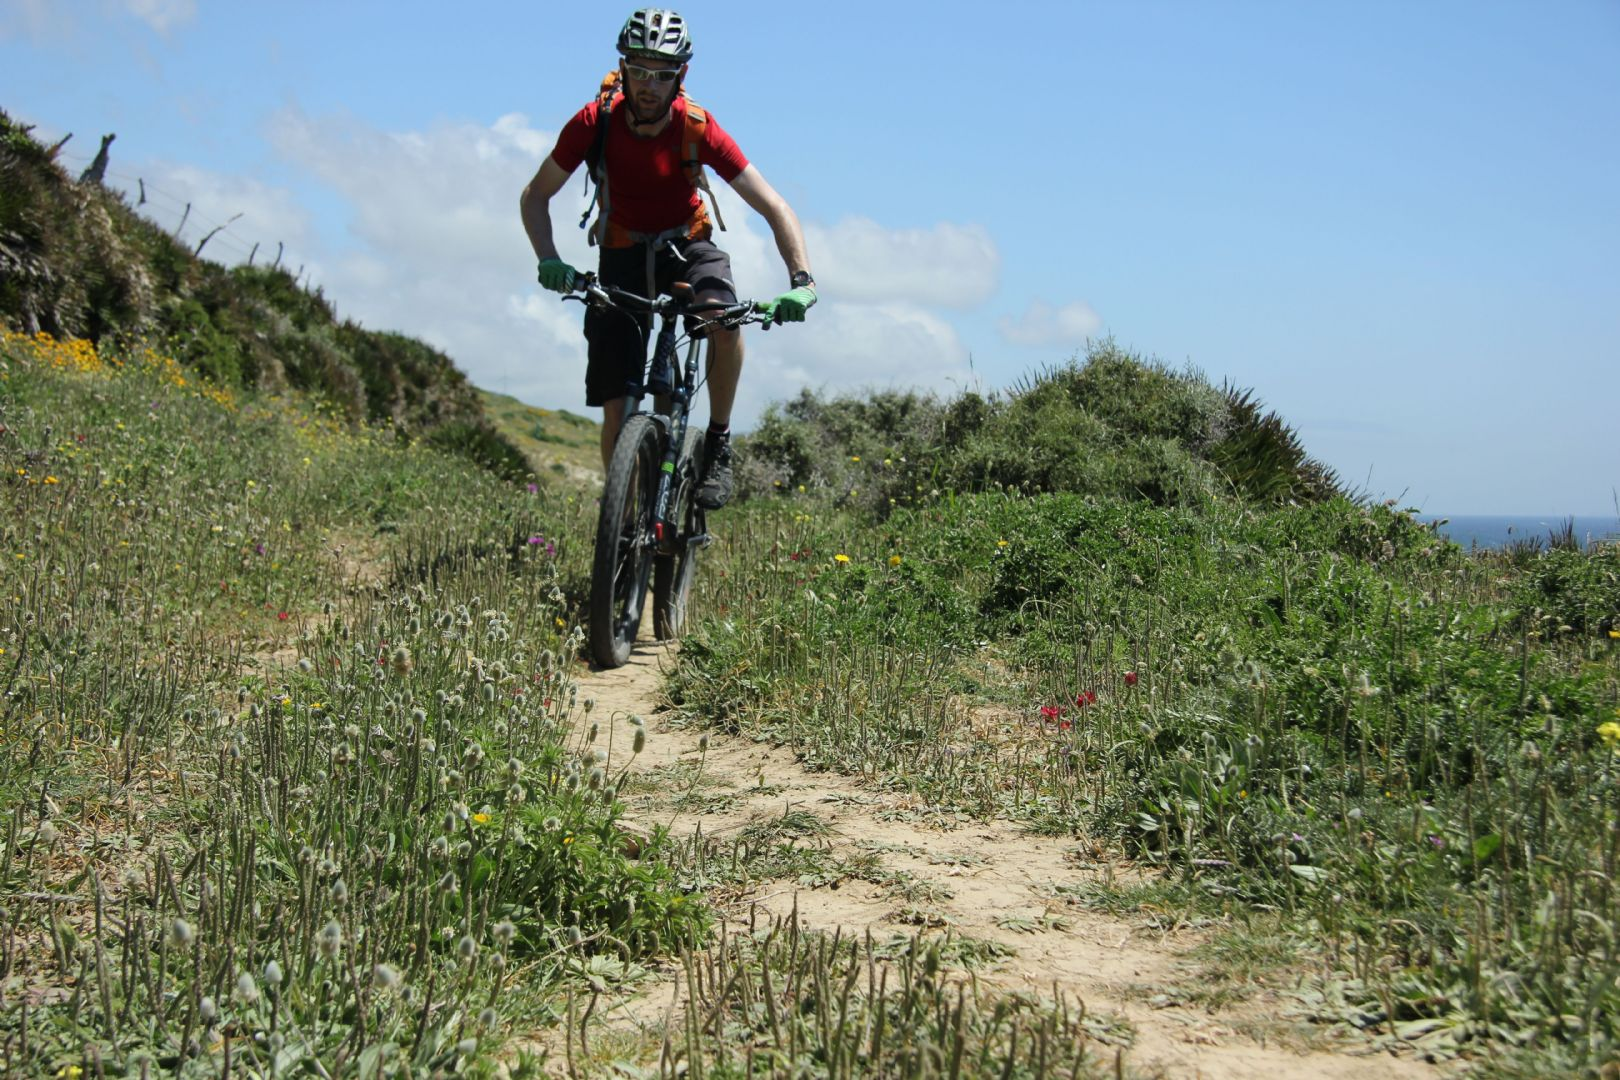 Spain Trans Andaluz MTB 9348.JPG - Spain - Trans Andaluz - Guided Mountain Bike Holiday - Mountain Biking